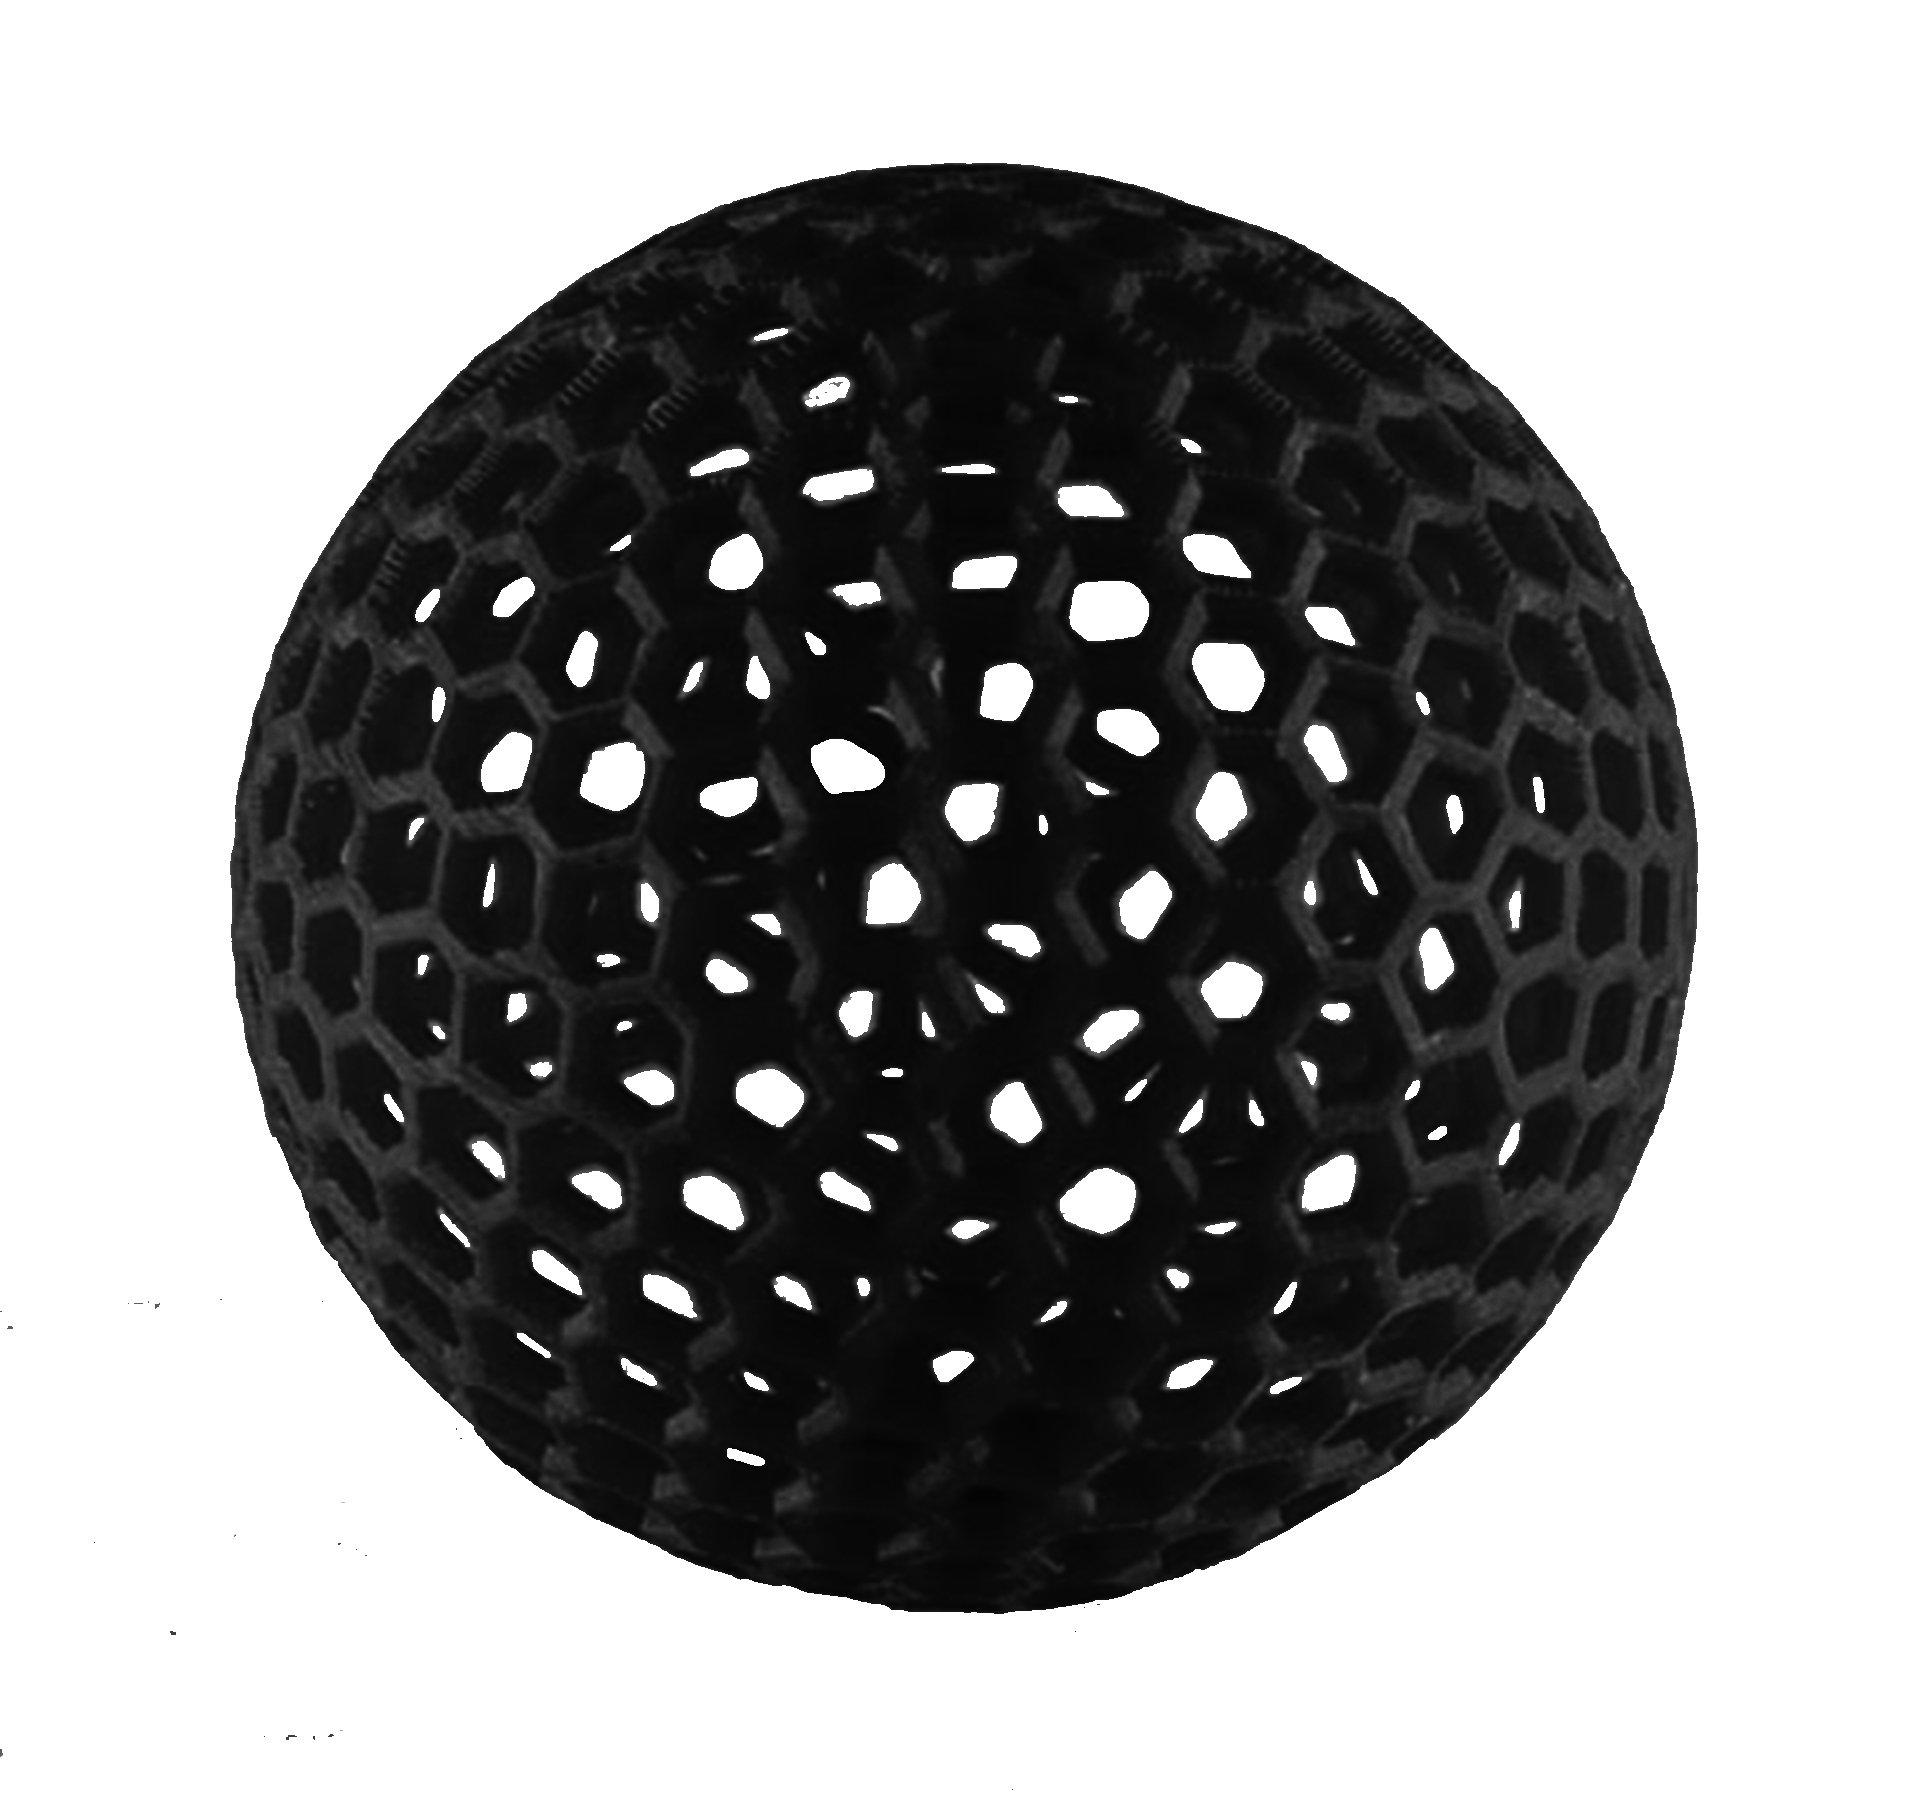 MakerJuice Black G+ UV 3D Plastic Printing Resin for SLA and DLP Printers (one 500 mL bottle).